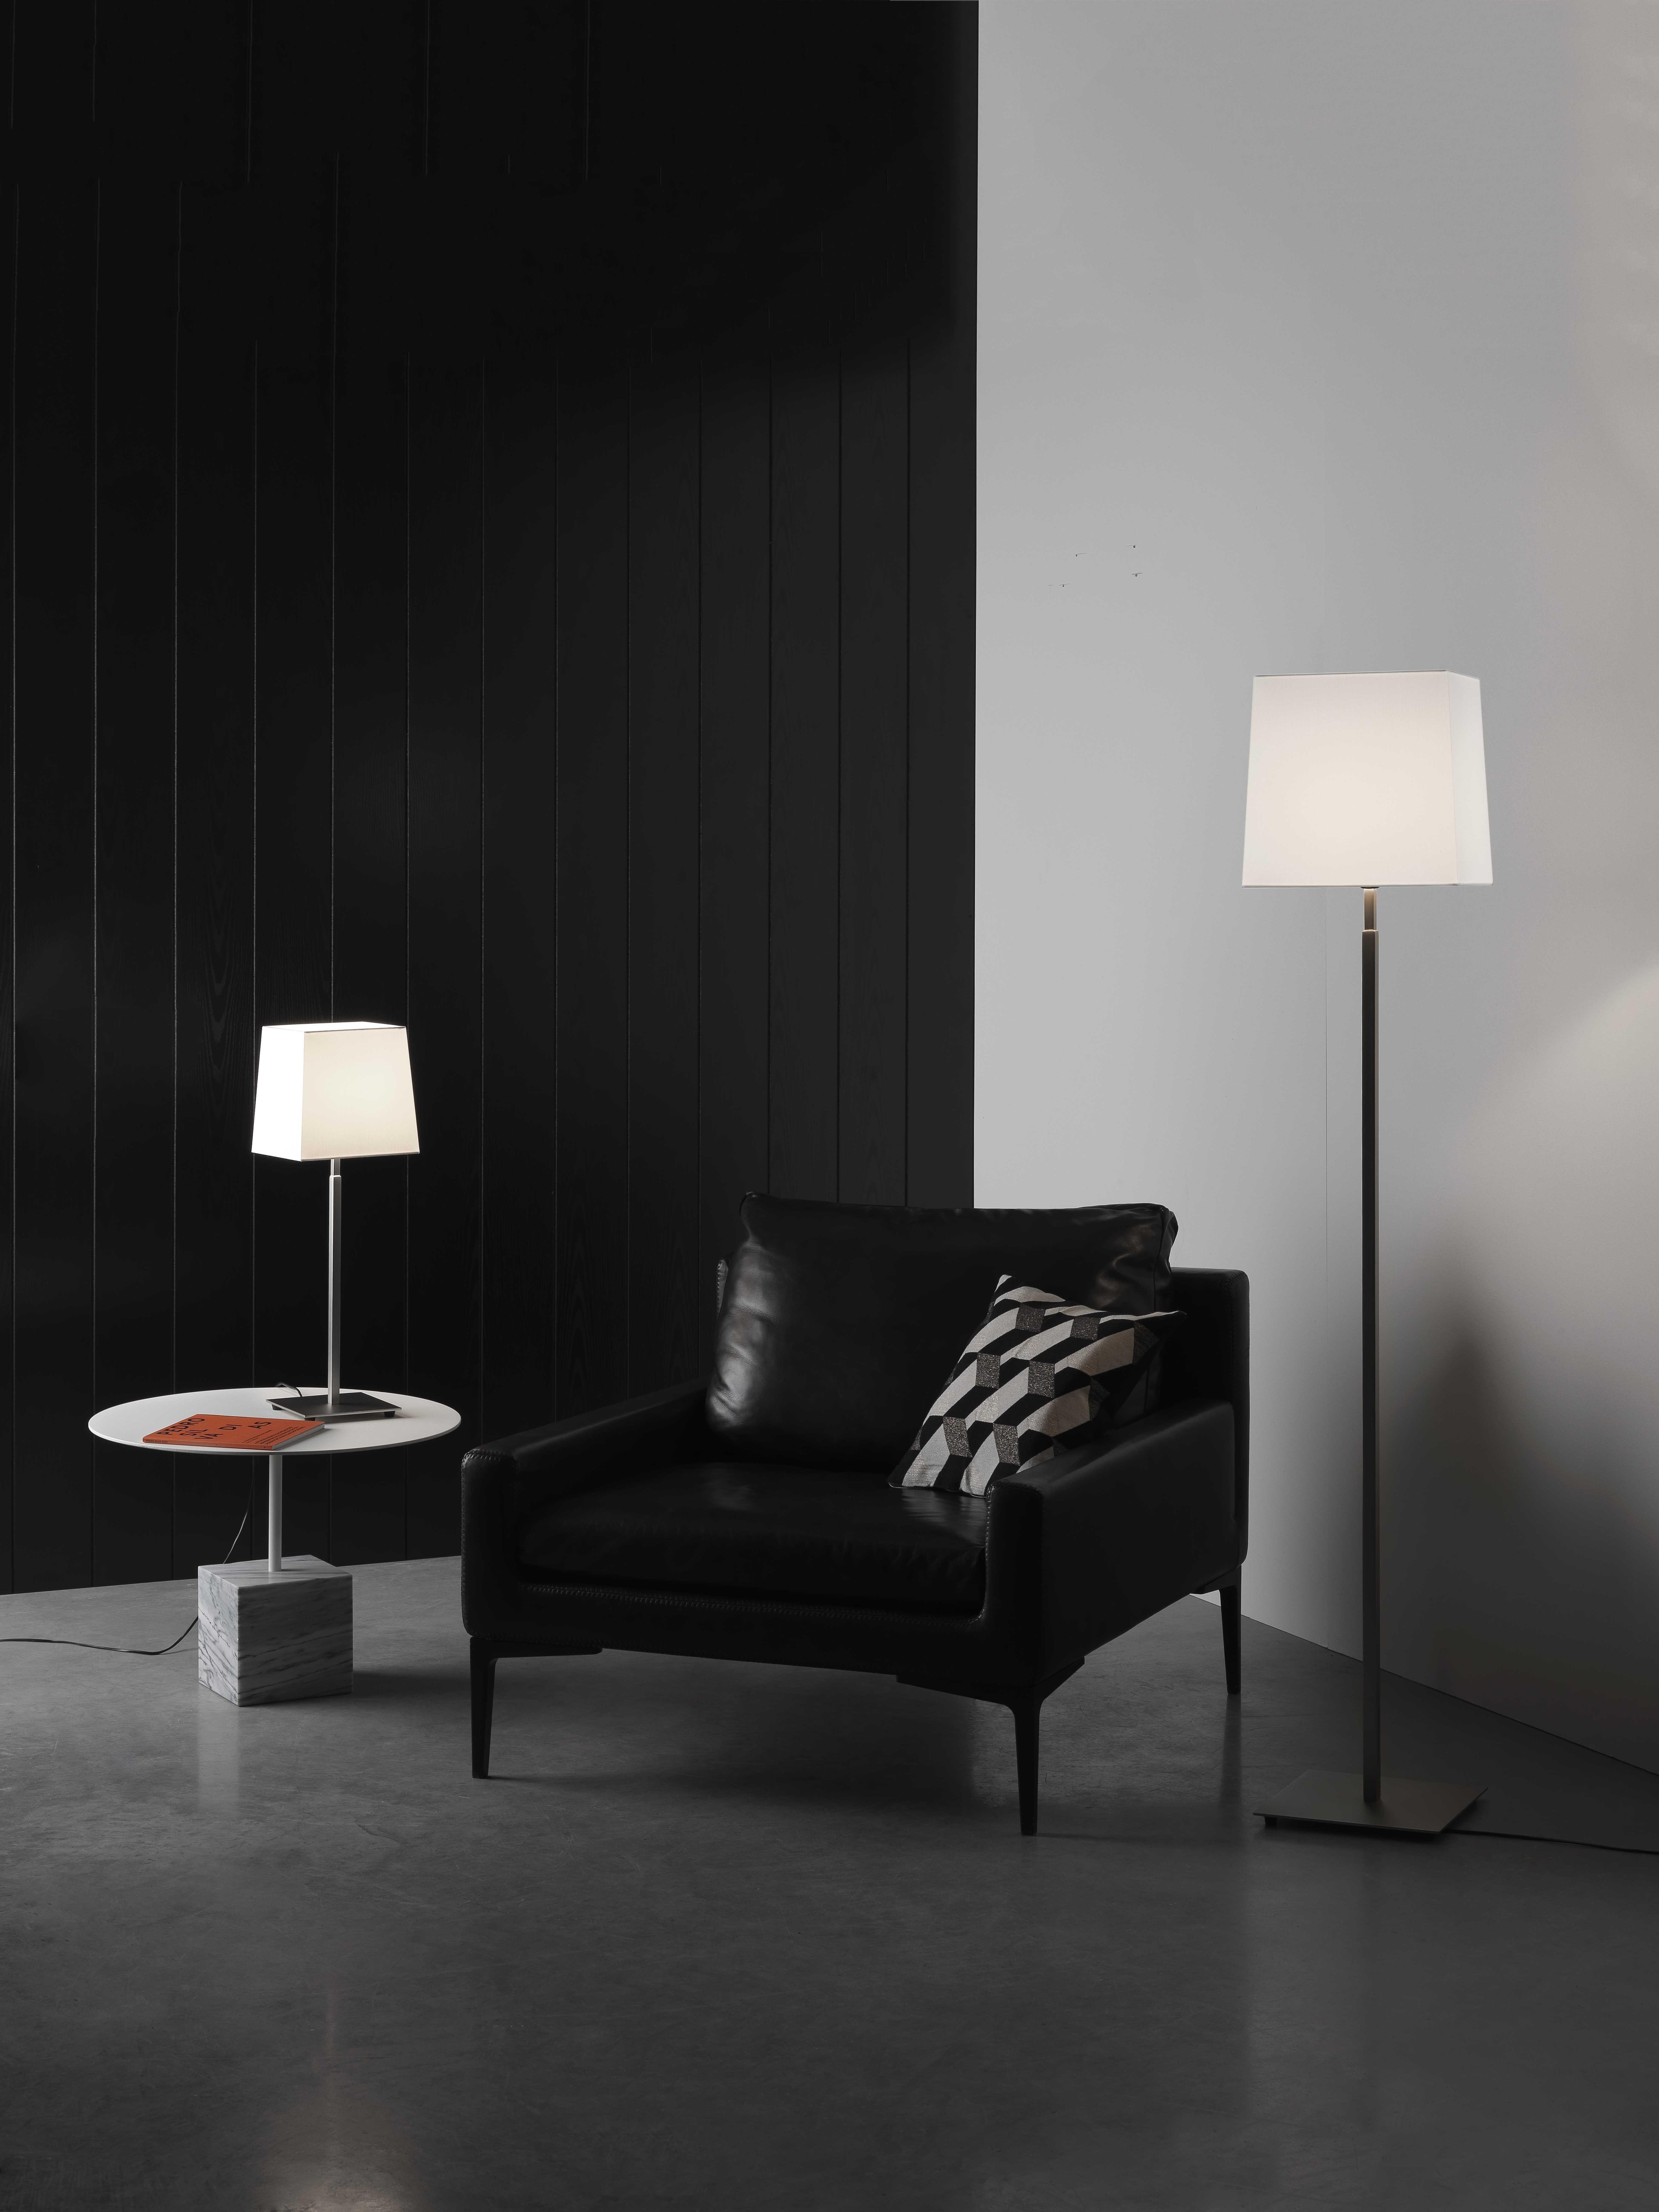 The Azumi floor lamp by Astro Light | Black Decor | Pinterest ...